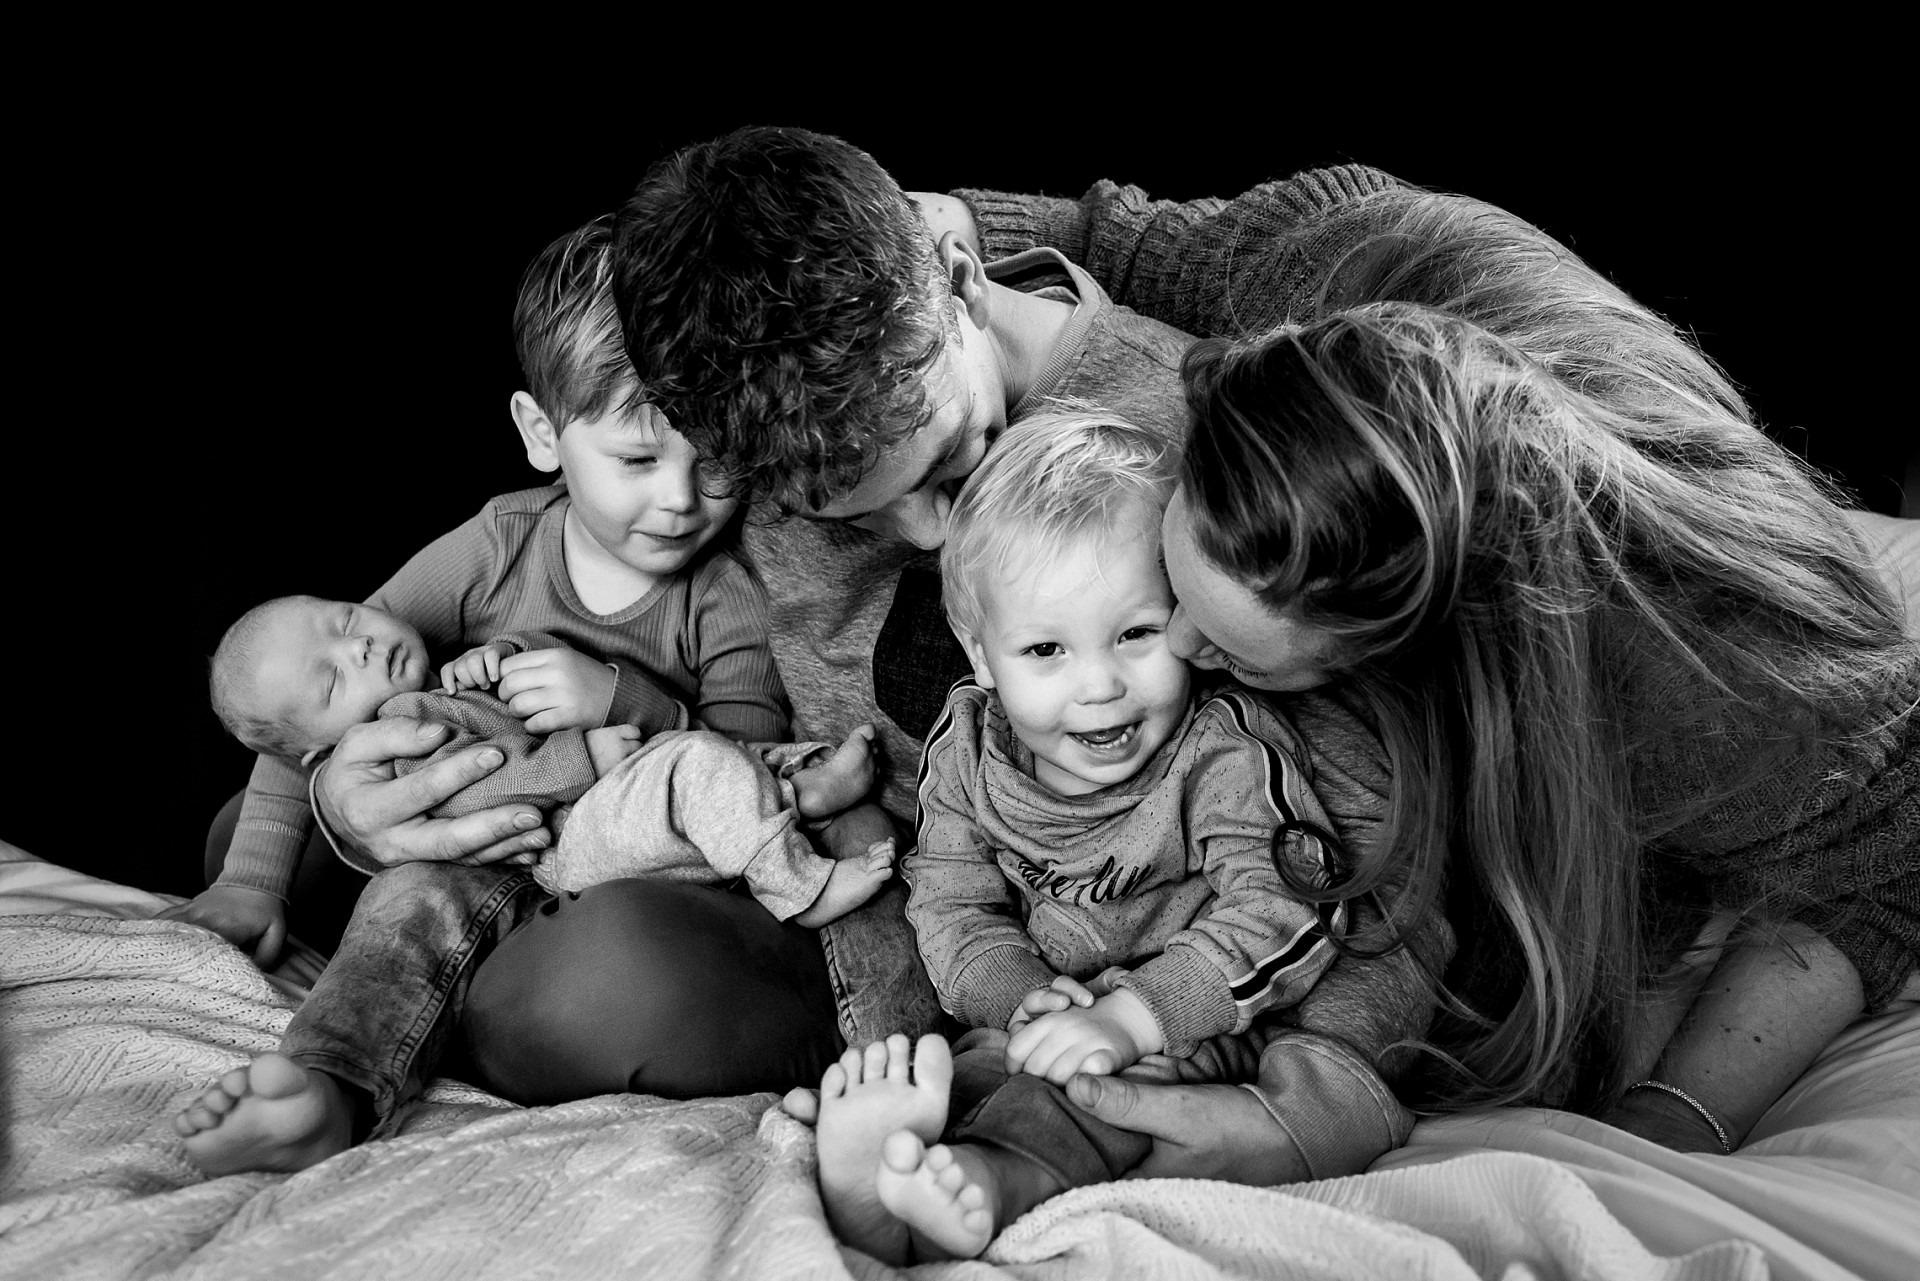 newbornfotograaf Wijchen, newbornfotografie Nijmegen